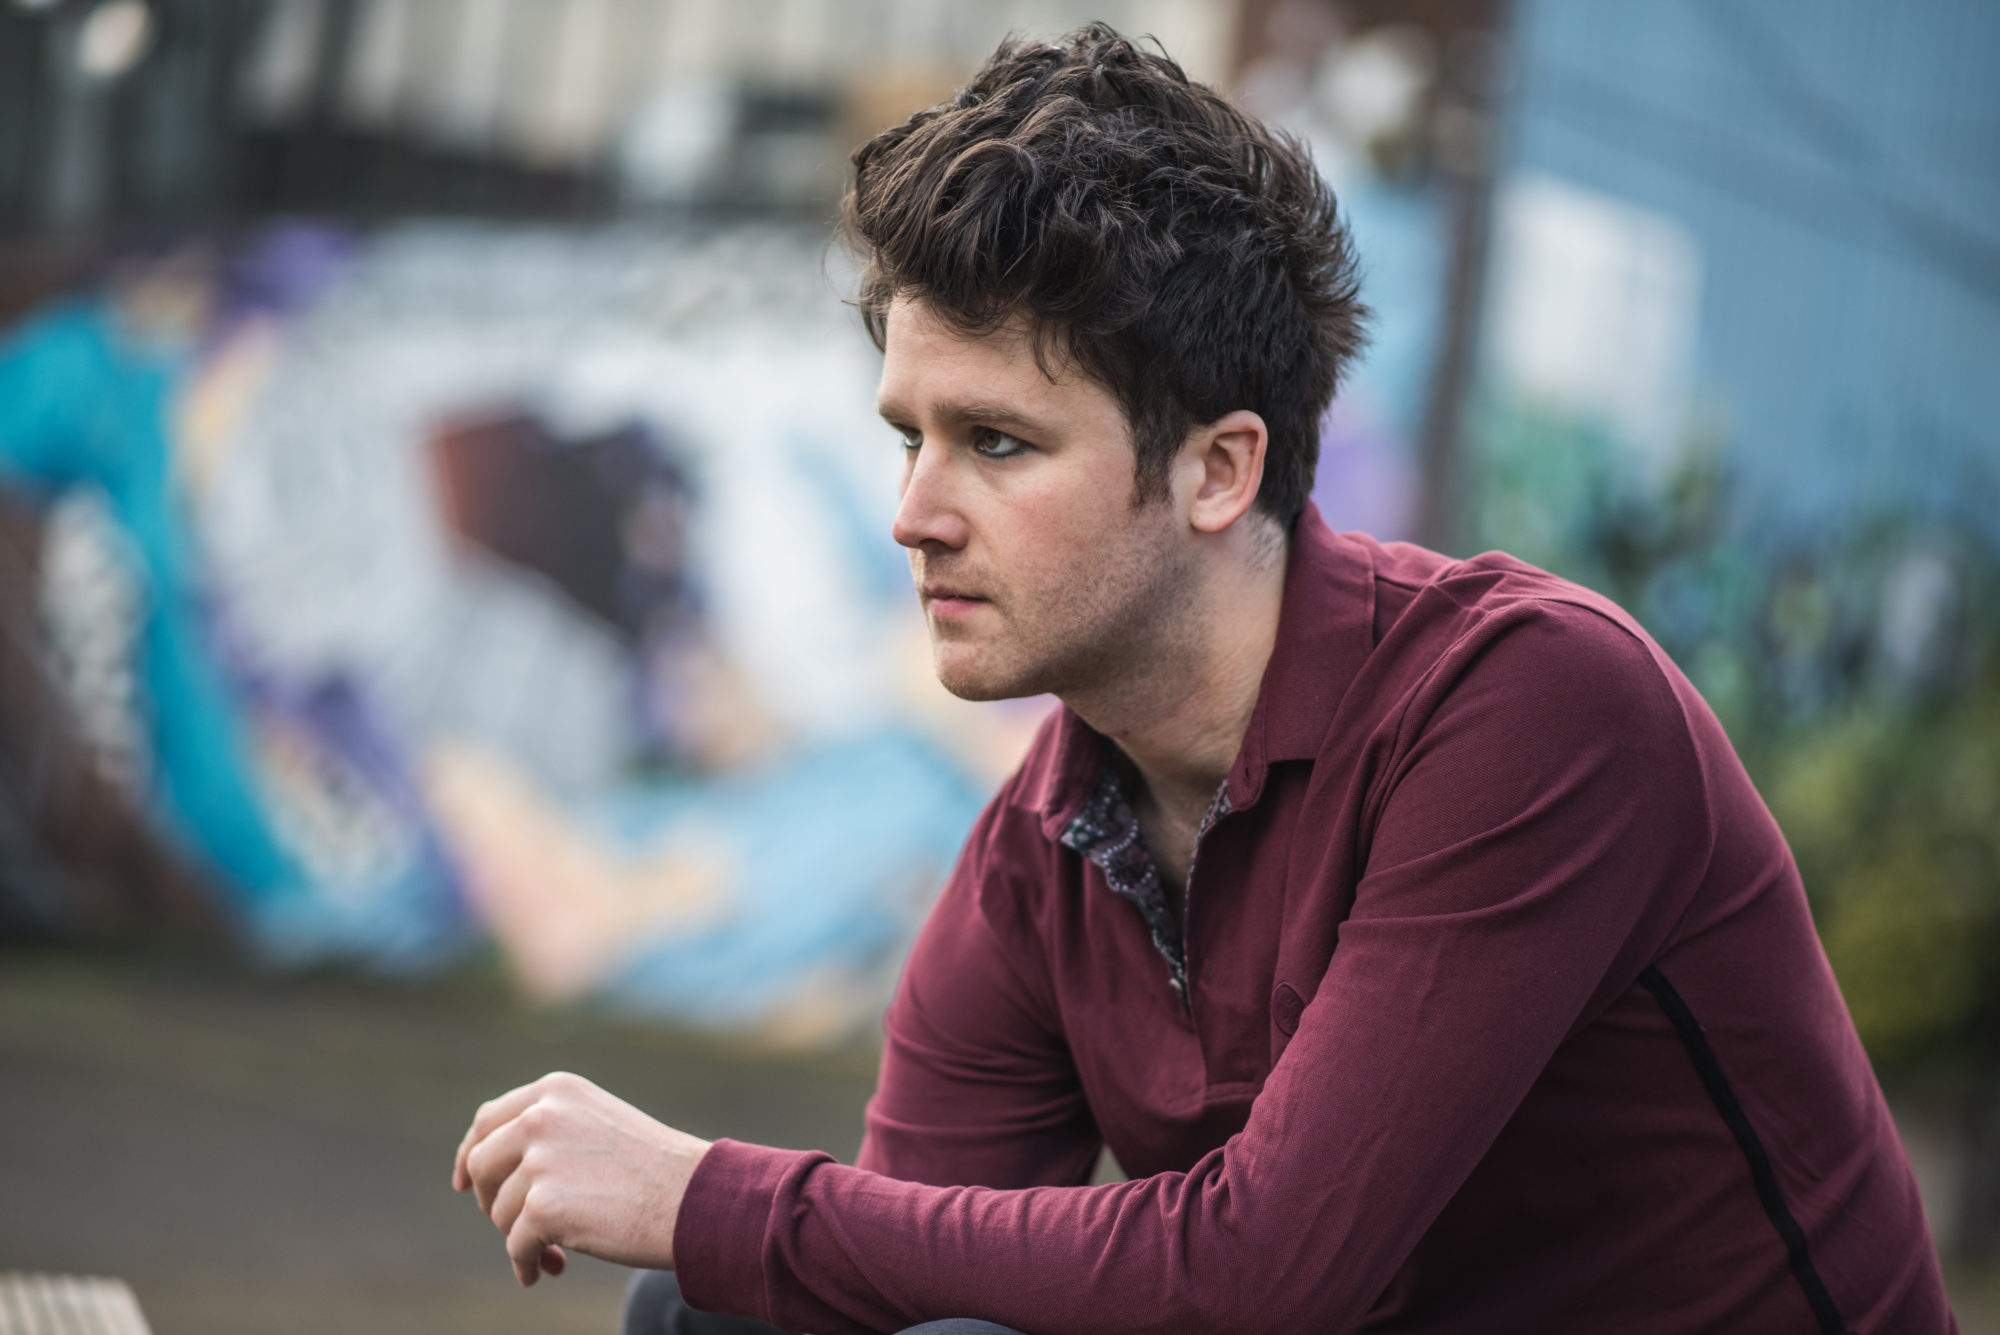 Matt, sitting, looks to the side wearing a burgundy jumper